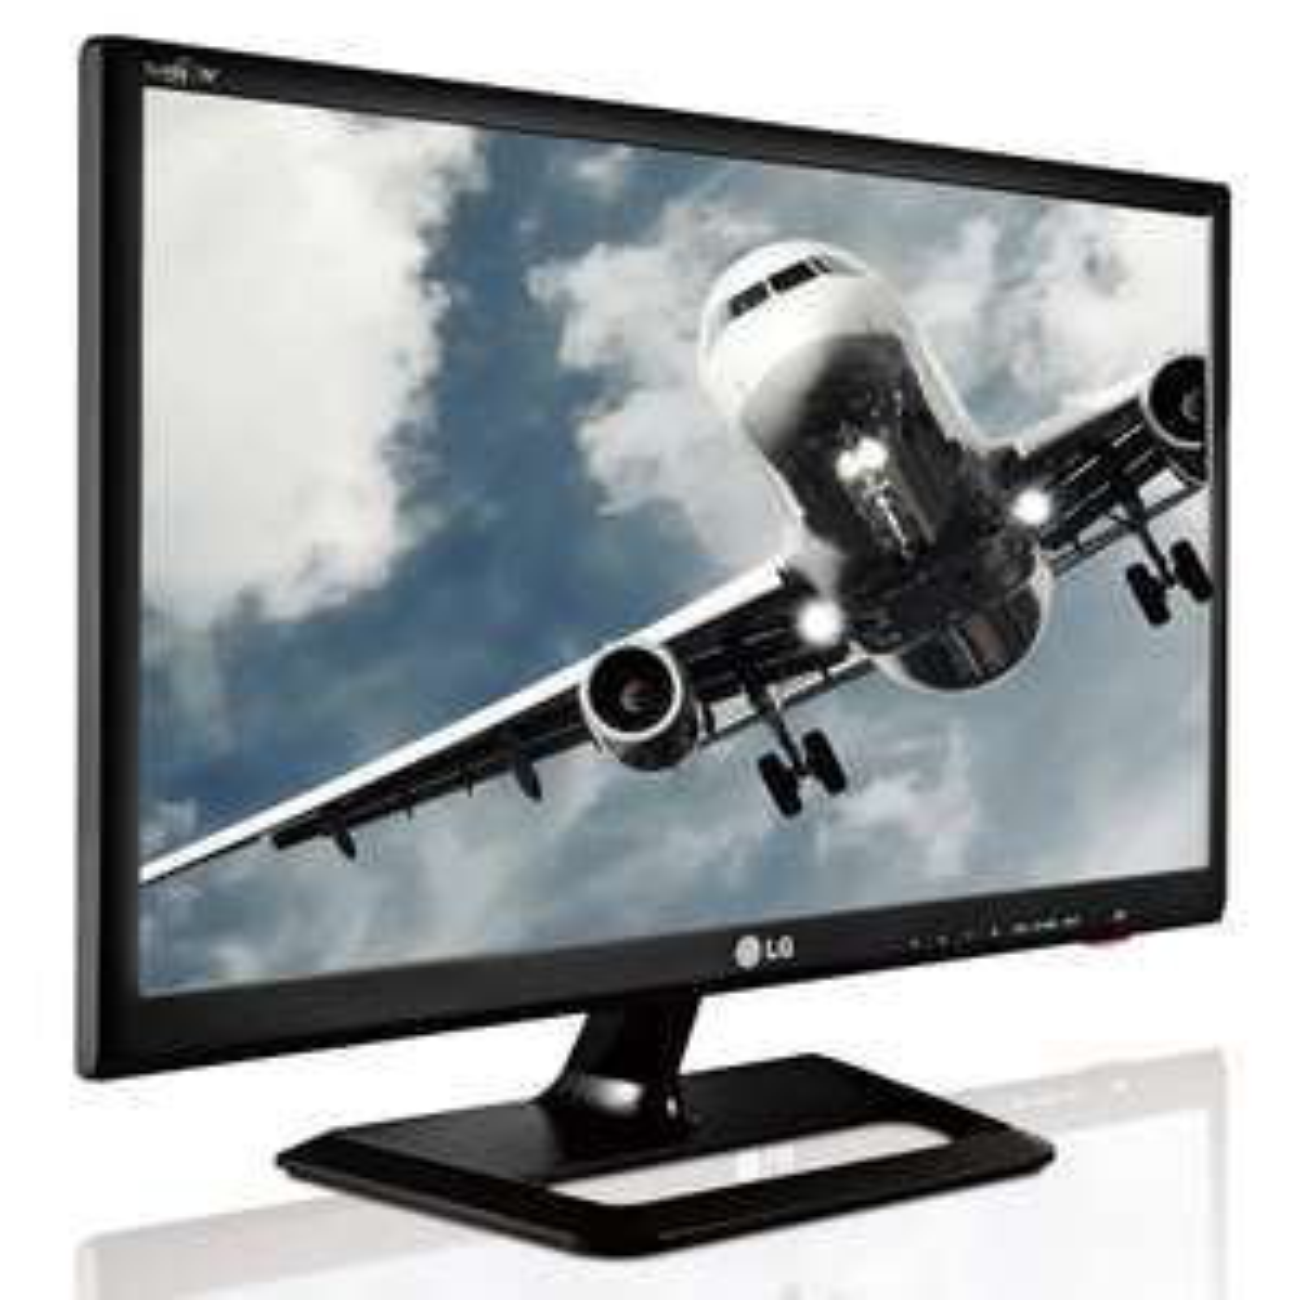 "Ecran PC (TV) 24"" LG M2452D-PZ - Full HD - Dalle IPS - TNT et Câble HD"